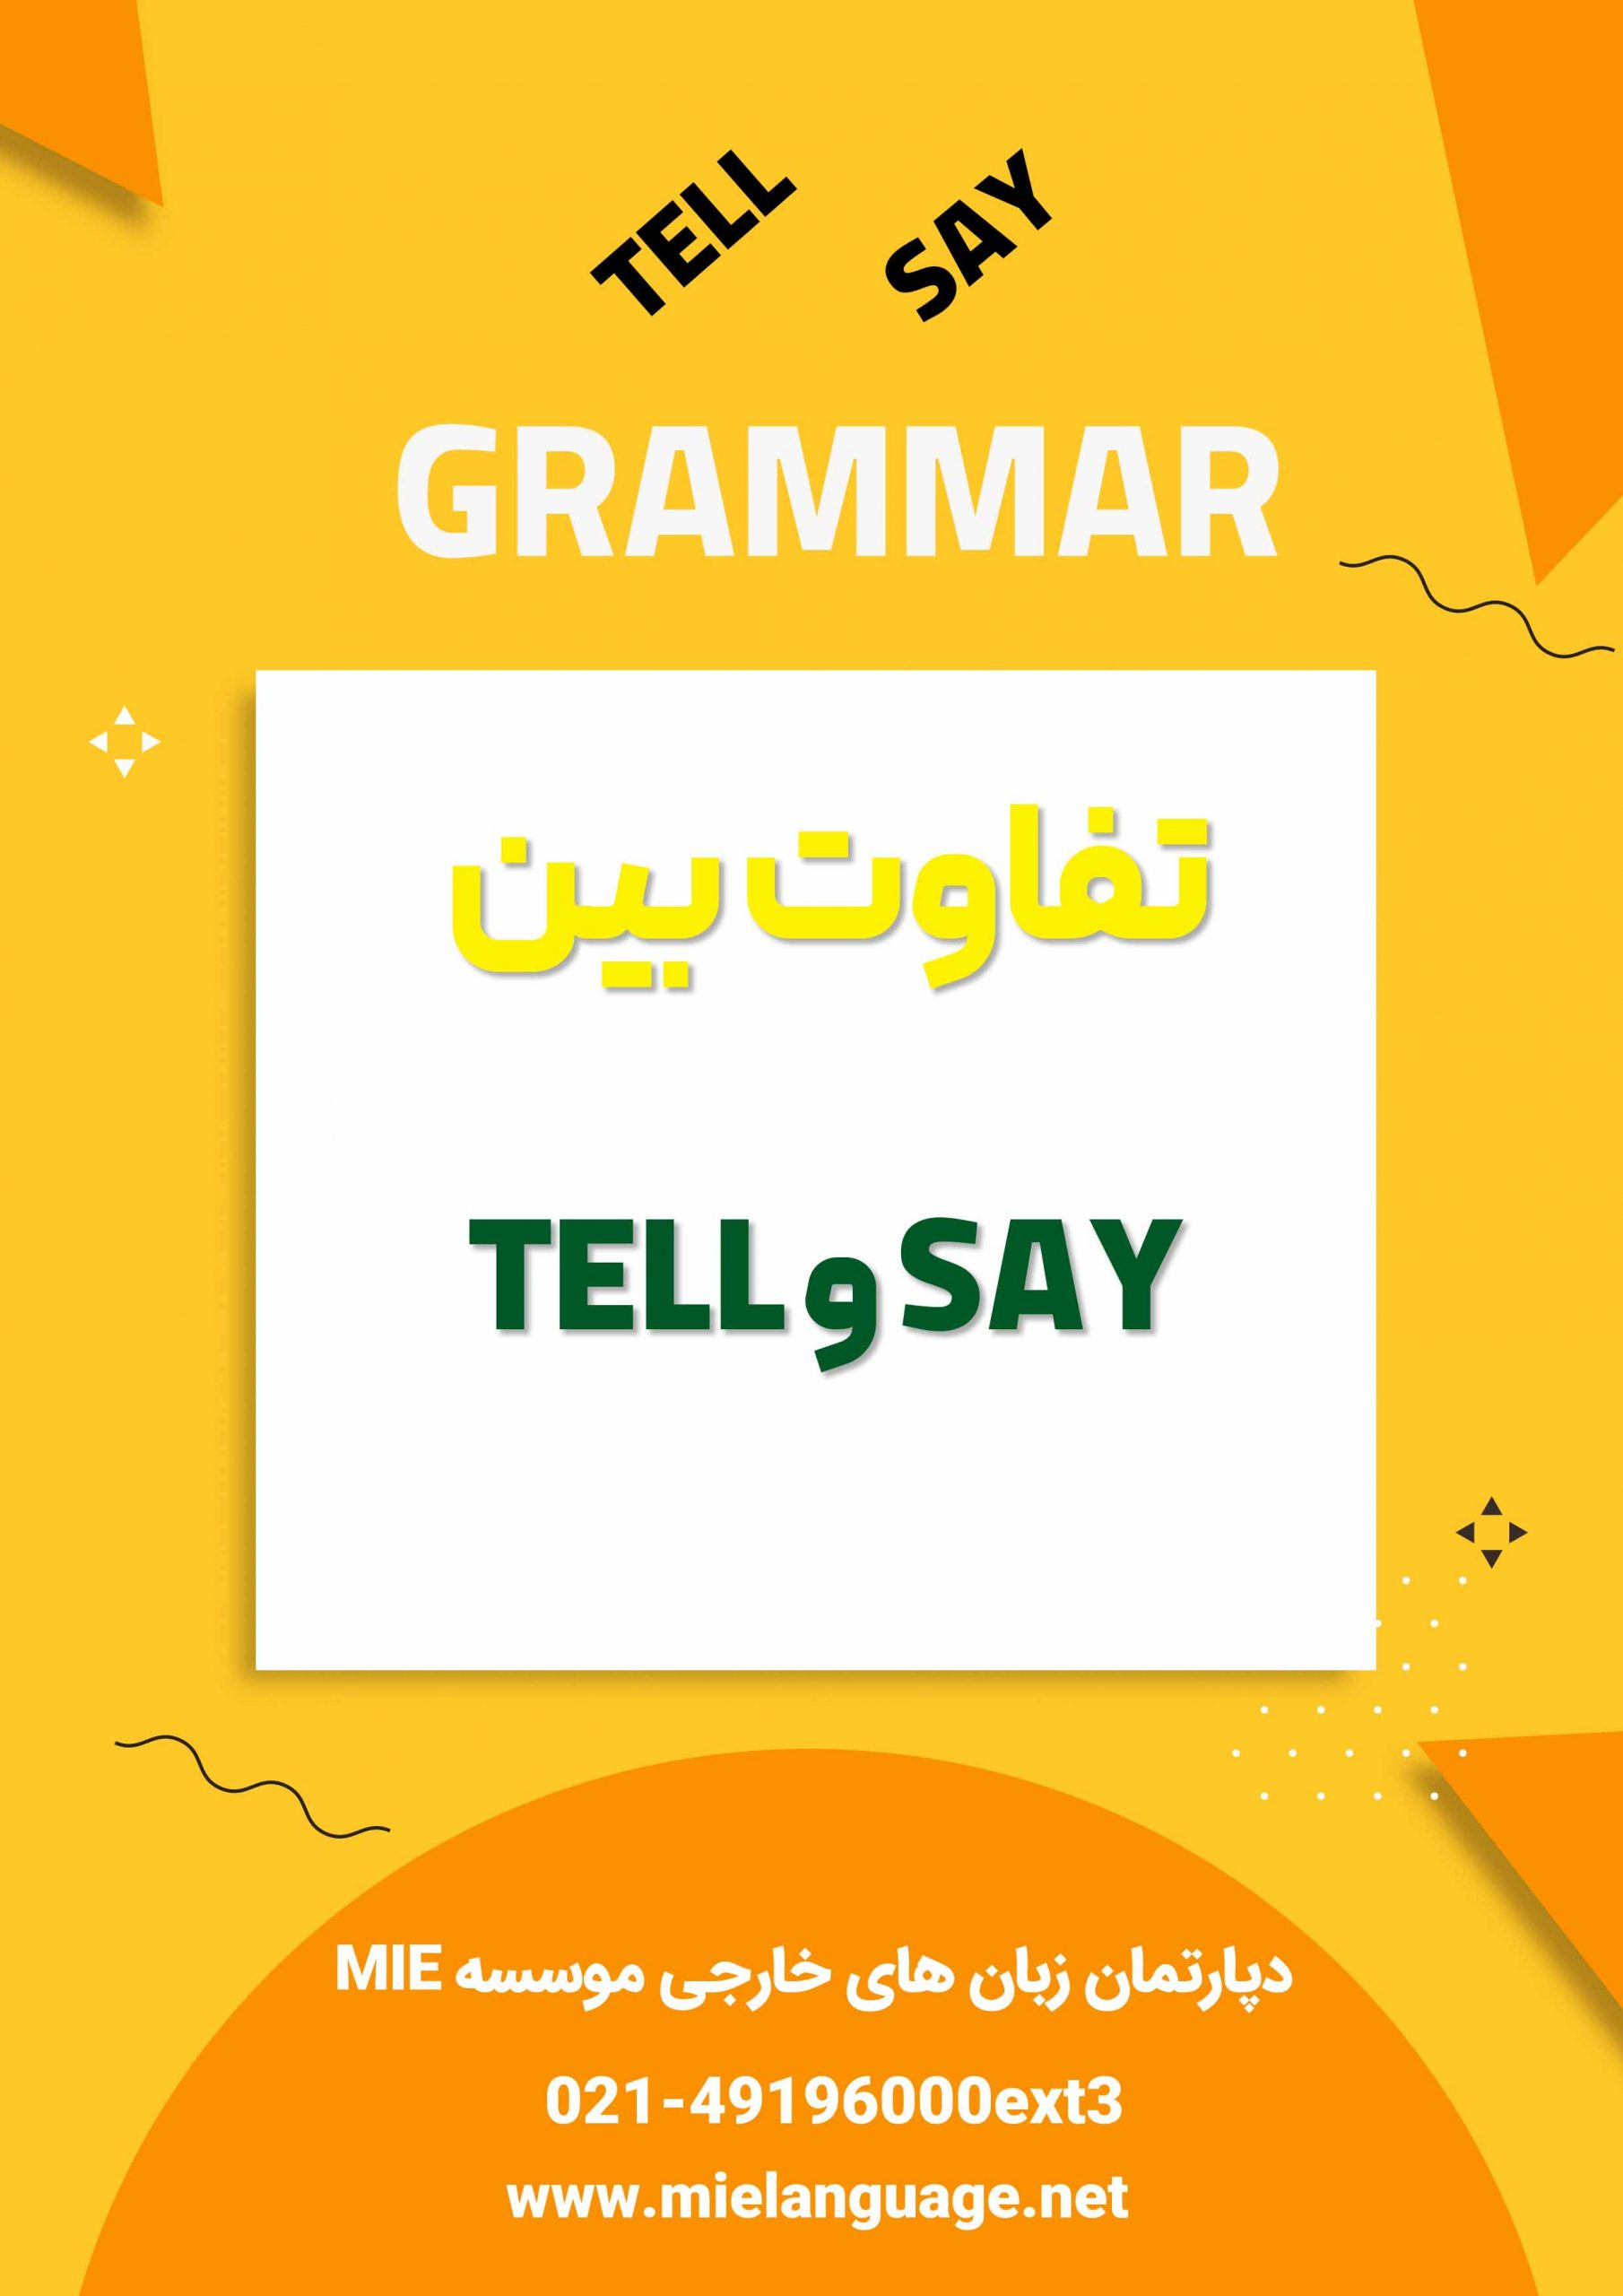 تفاوت بین say و tell